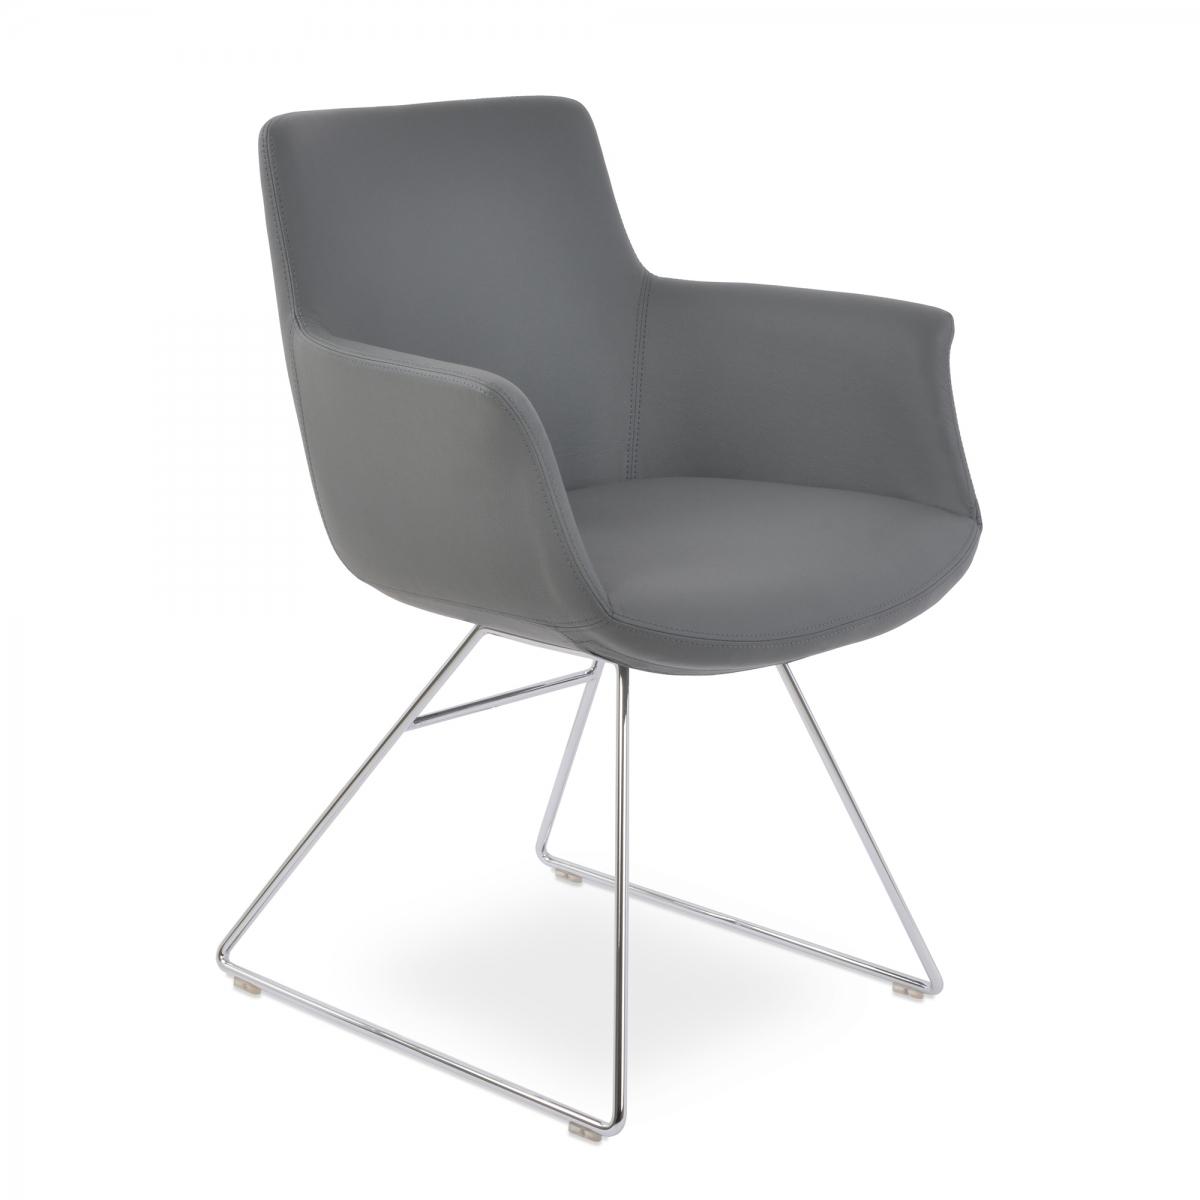 Bottega Arm Wire Guest Chair